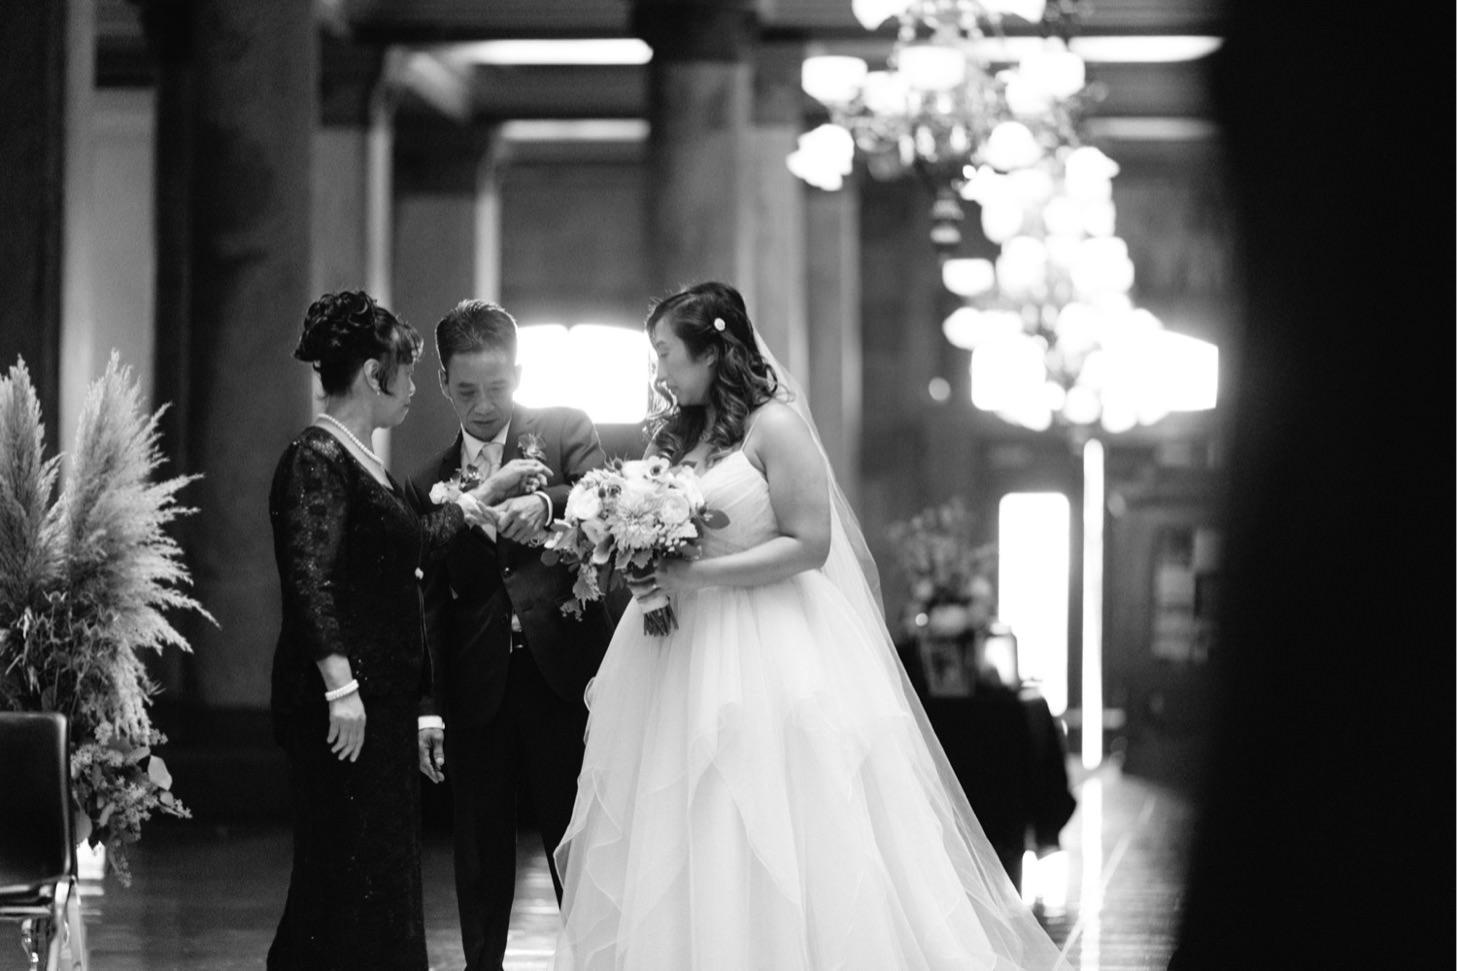 indiana-state-house-wedding-downtown-indianapolis-wedding-photographer028.JPG